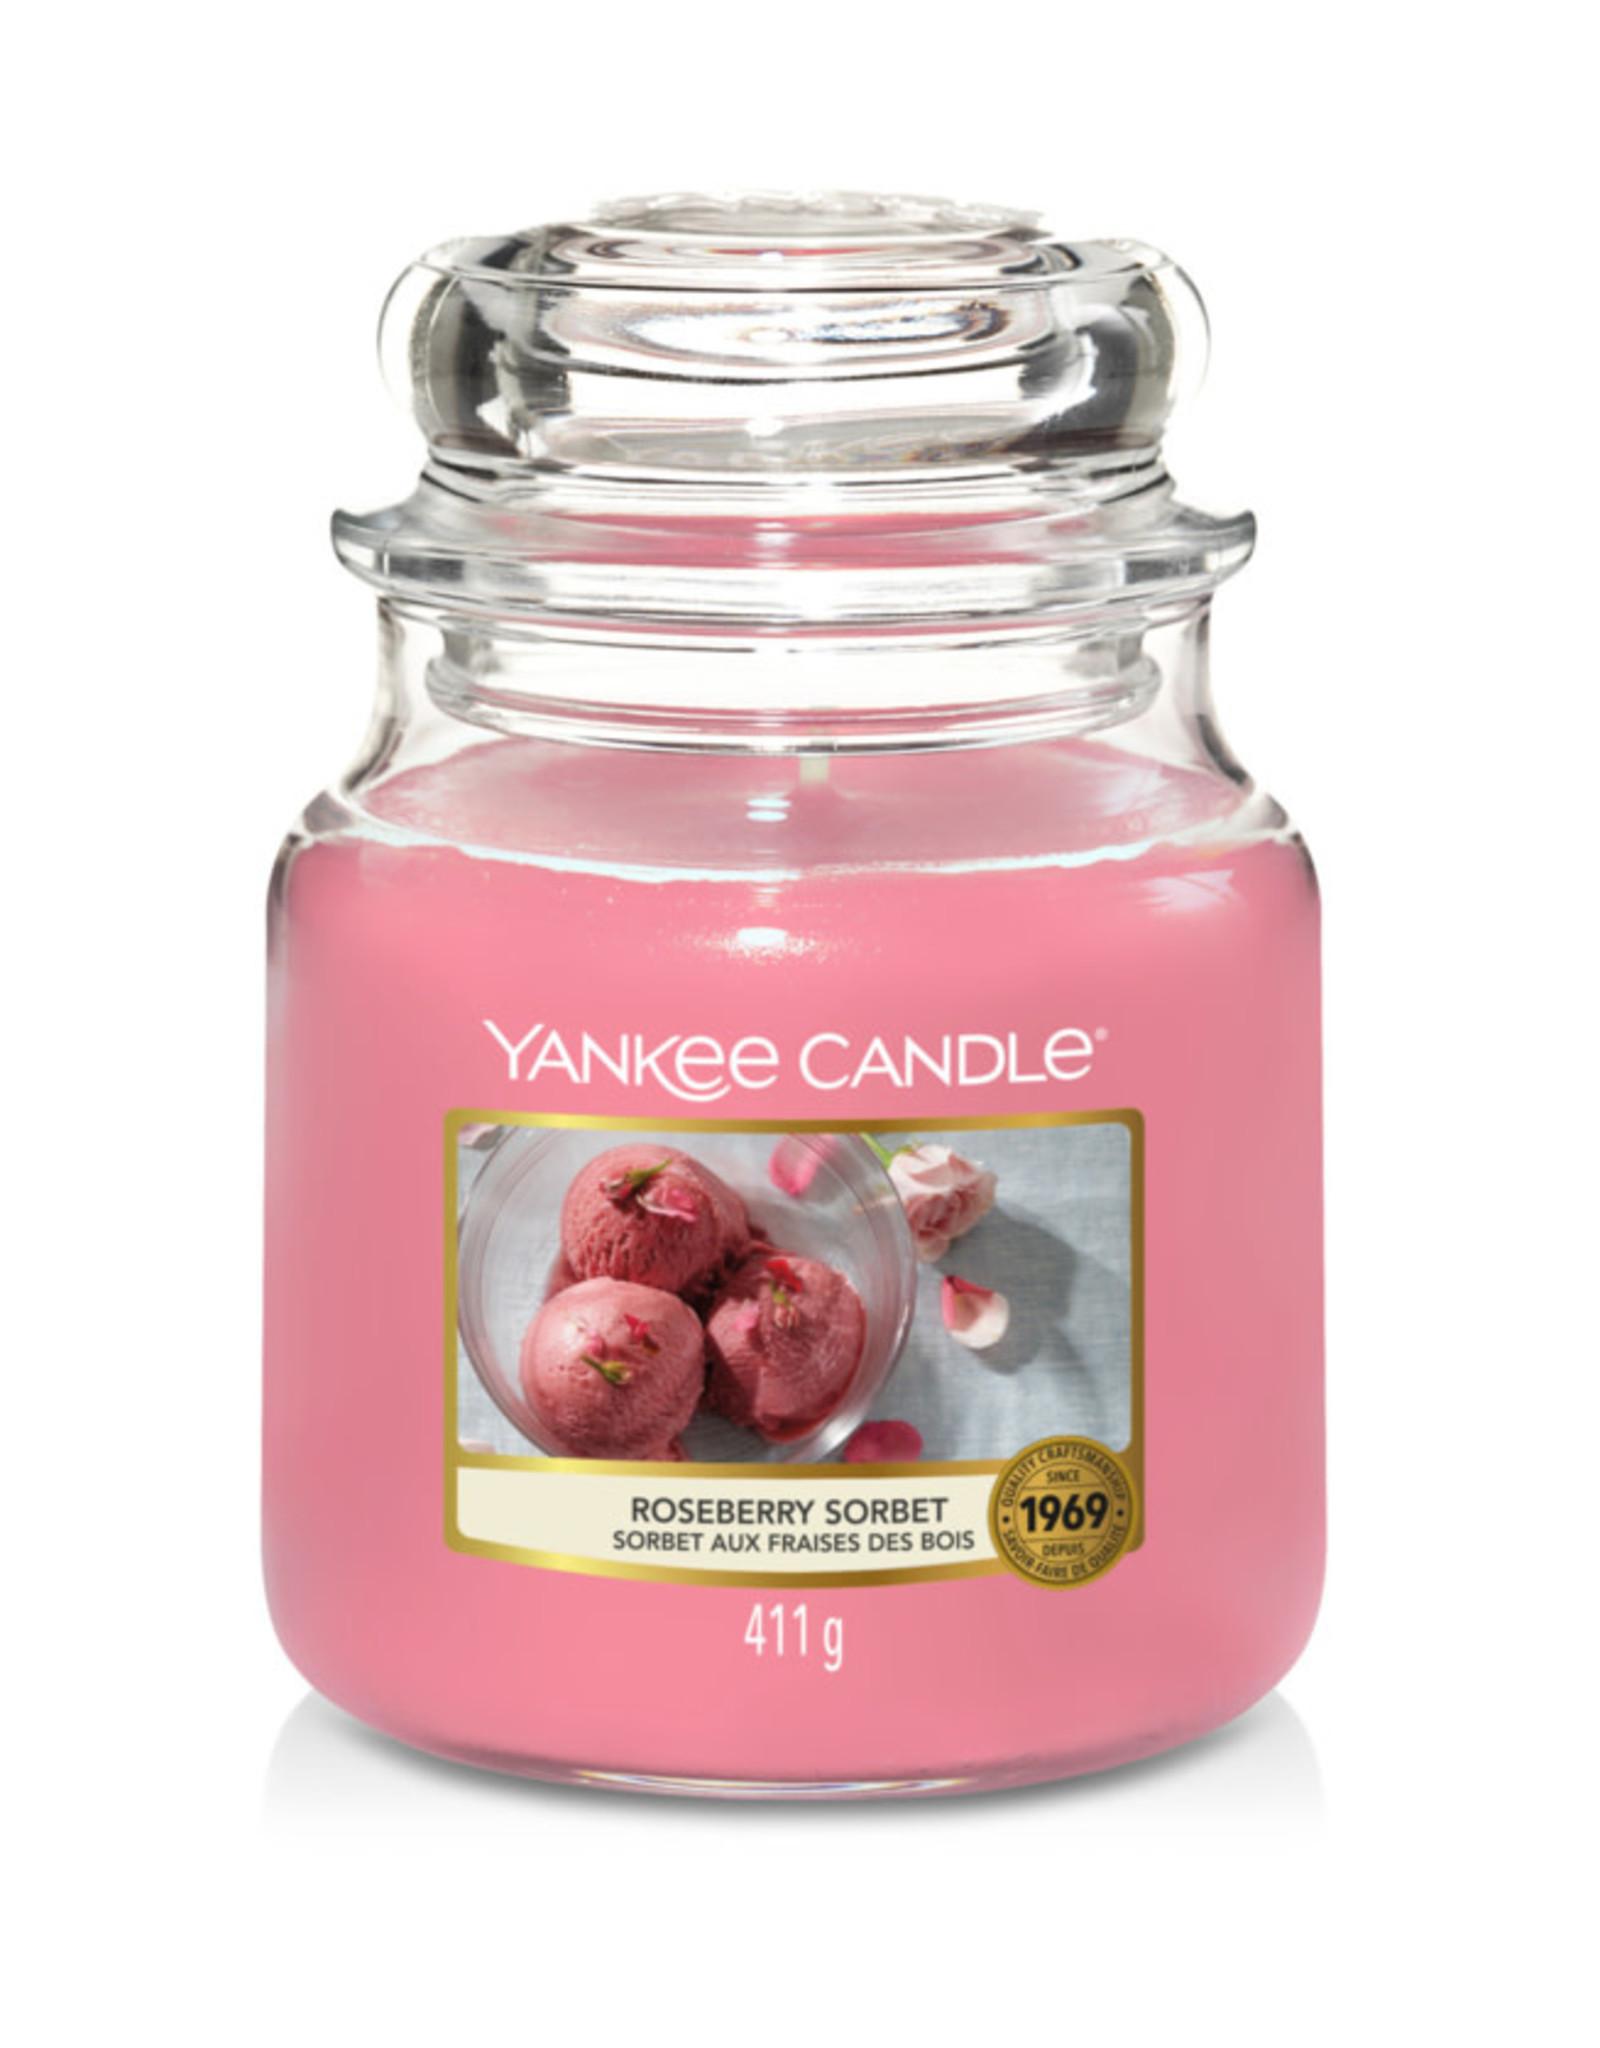 Yankee Candle Roseberry Sorbet Yankee Candle Medium